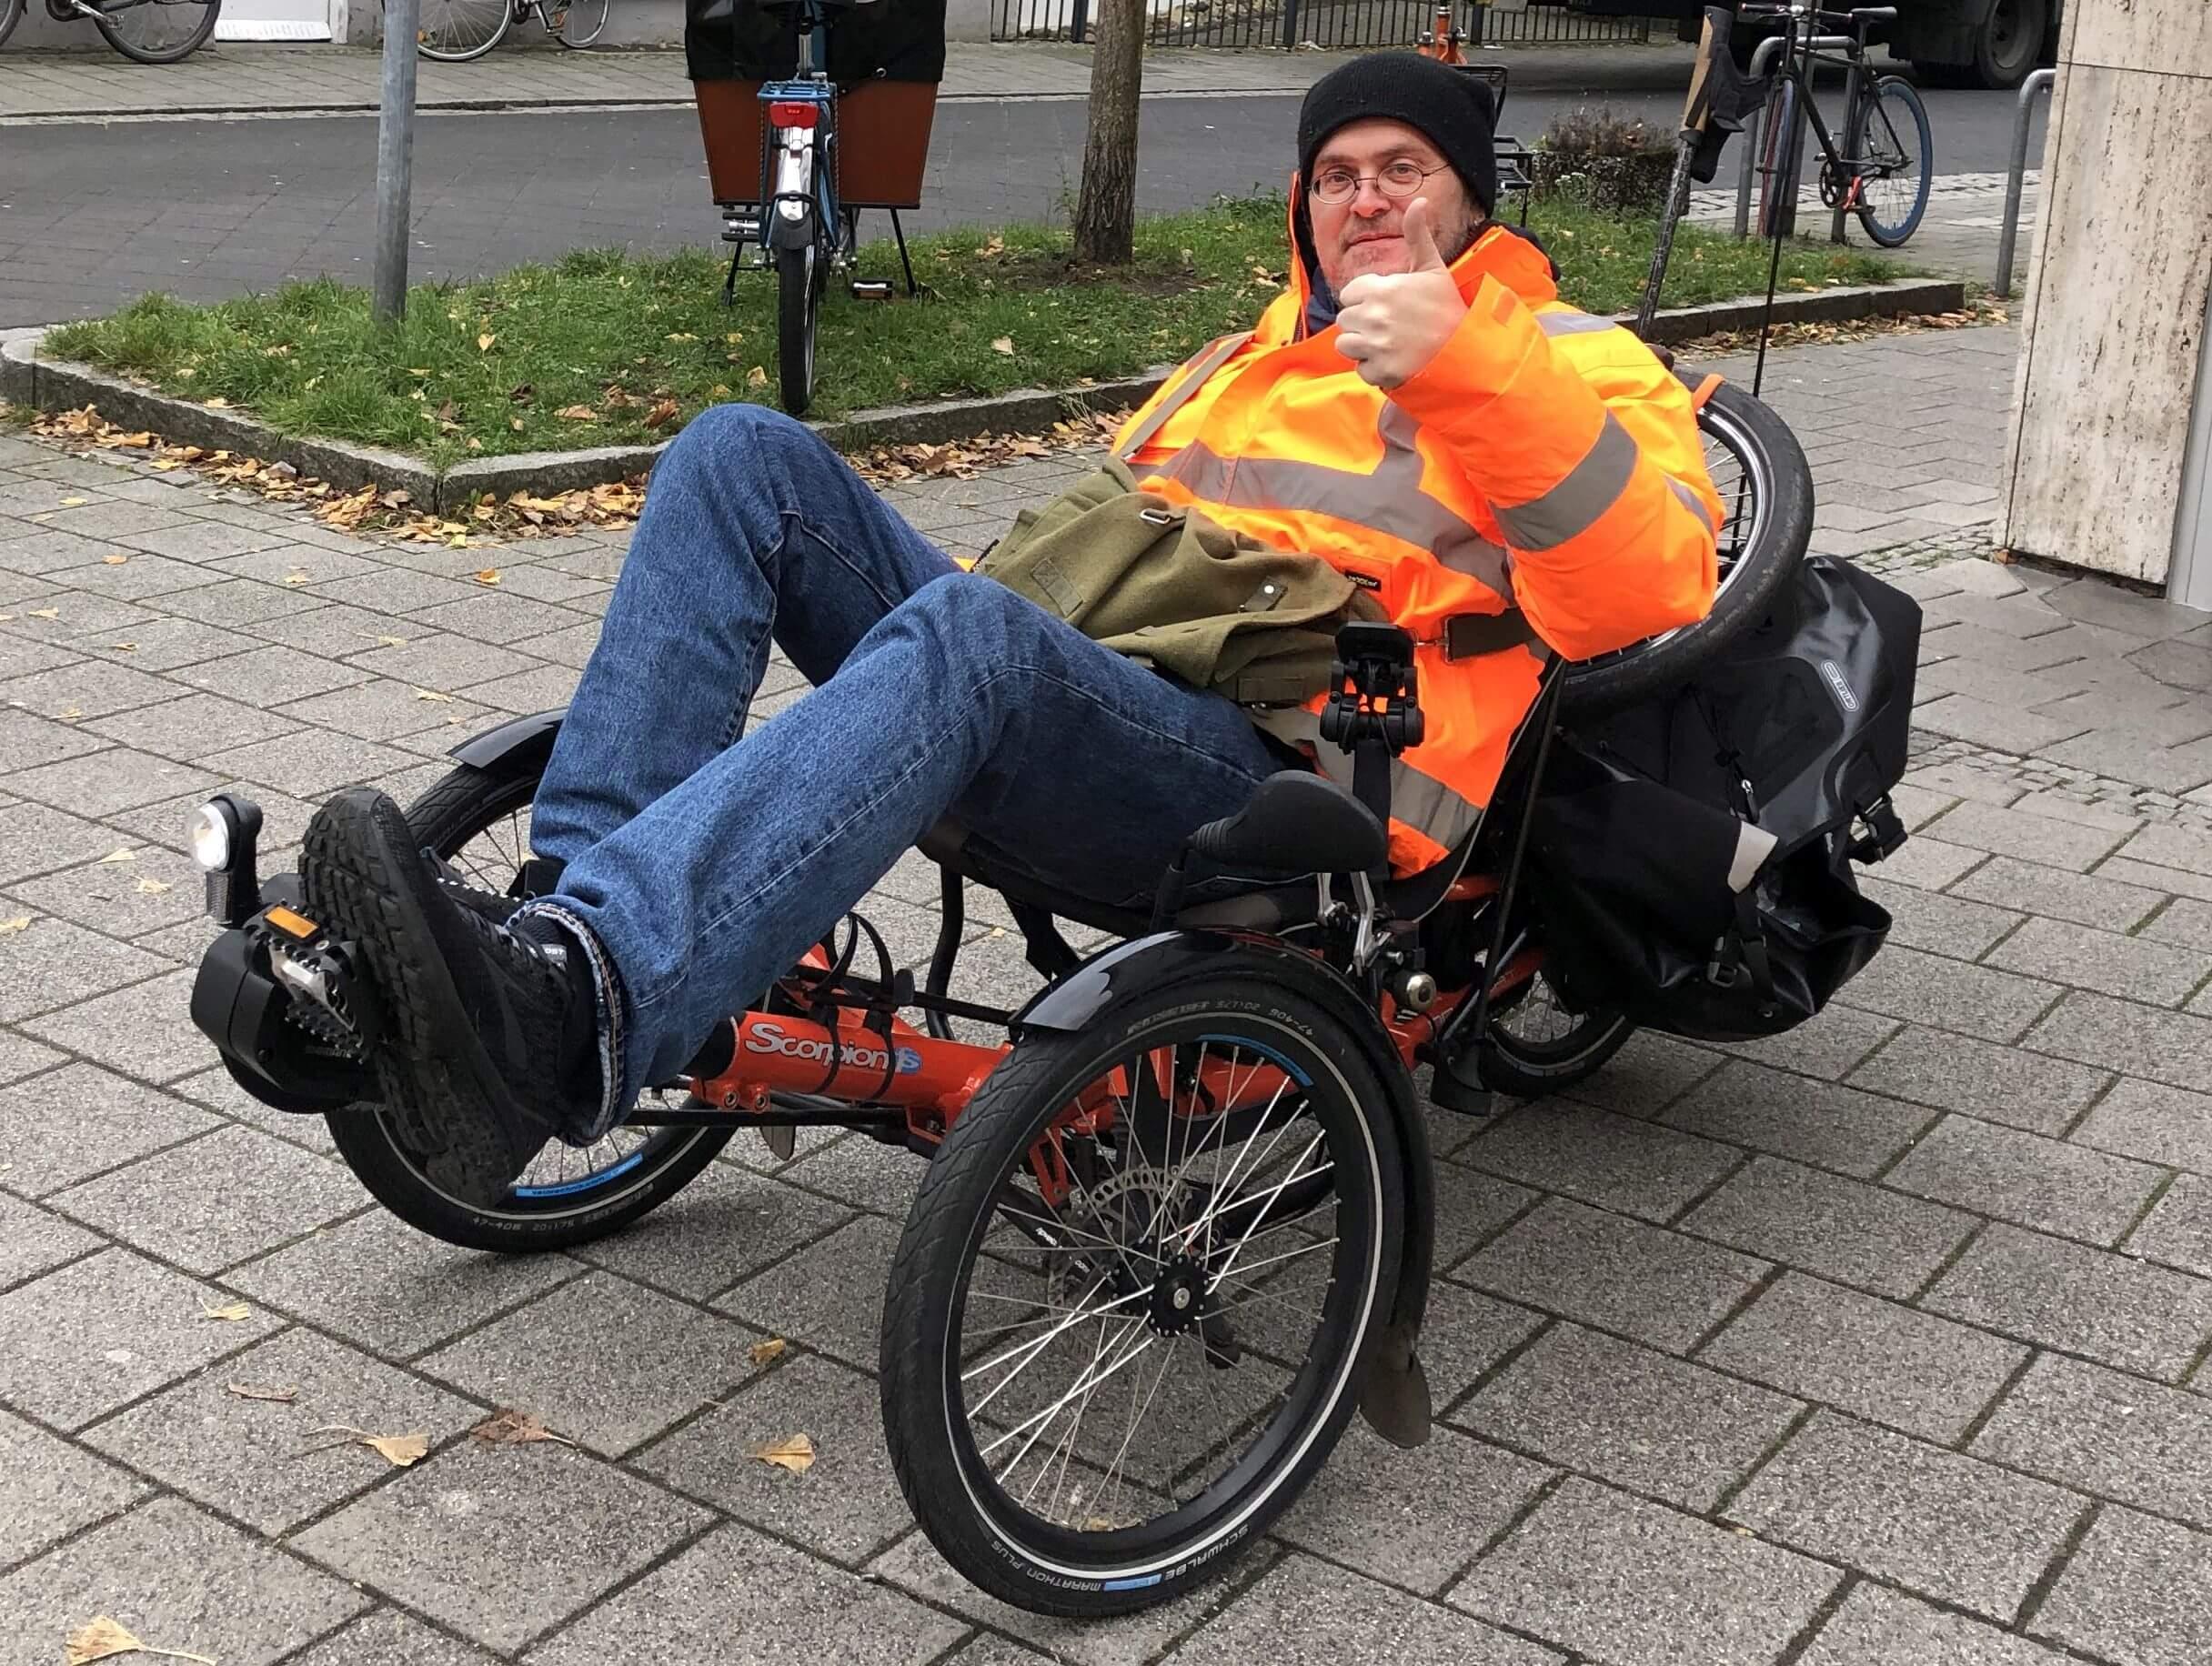 Kai mit motorisiertem Rad